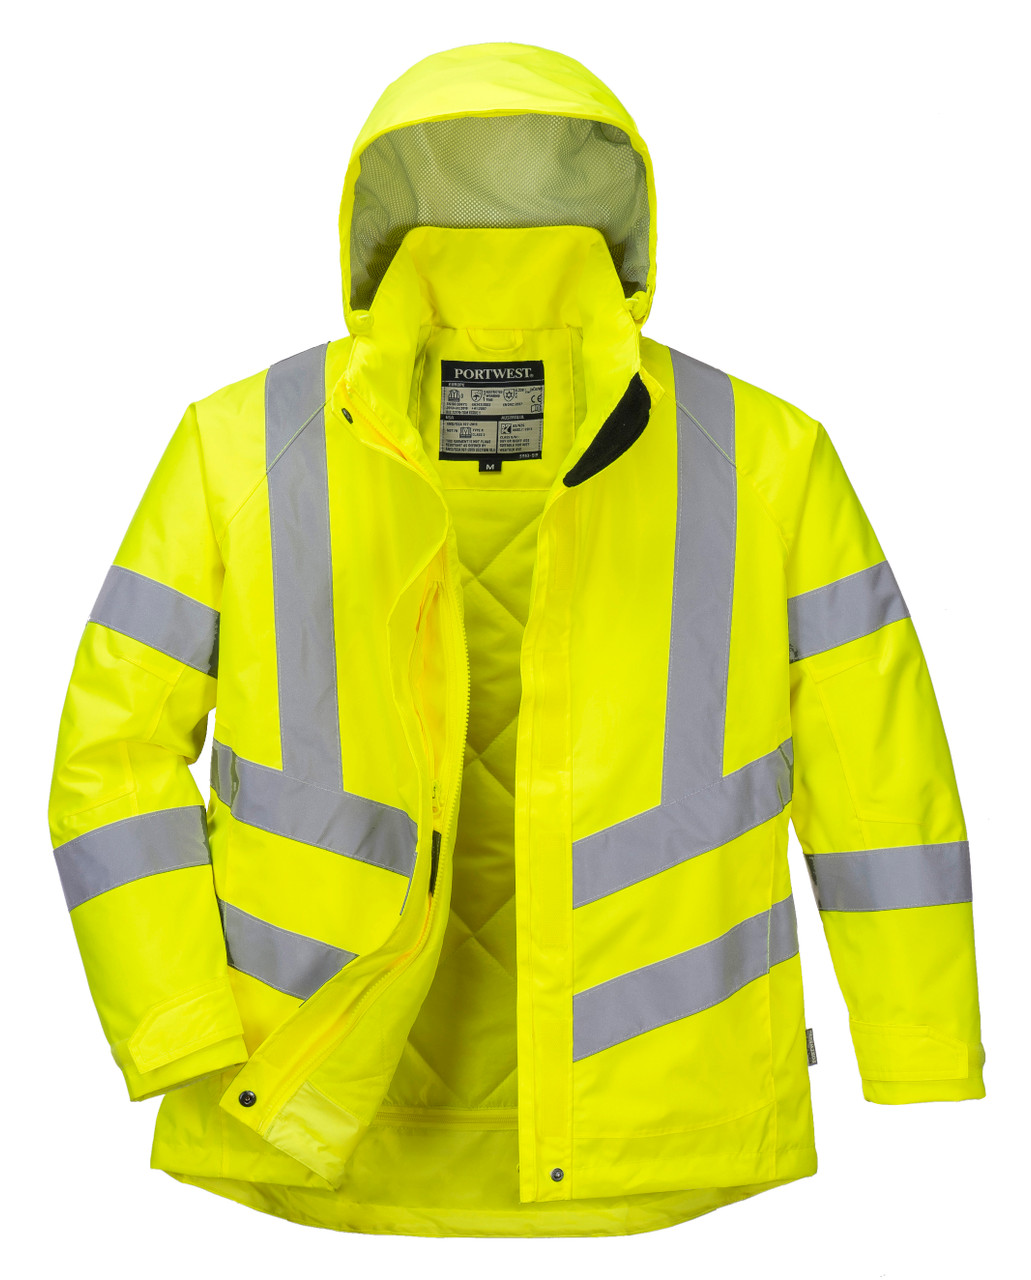 Waterproof Jacket Portwest LW70 Womens High Visibility Hi Vis